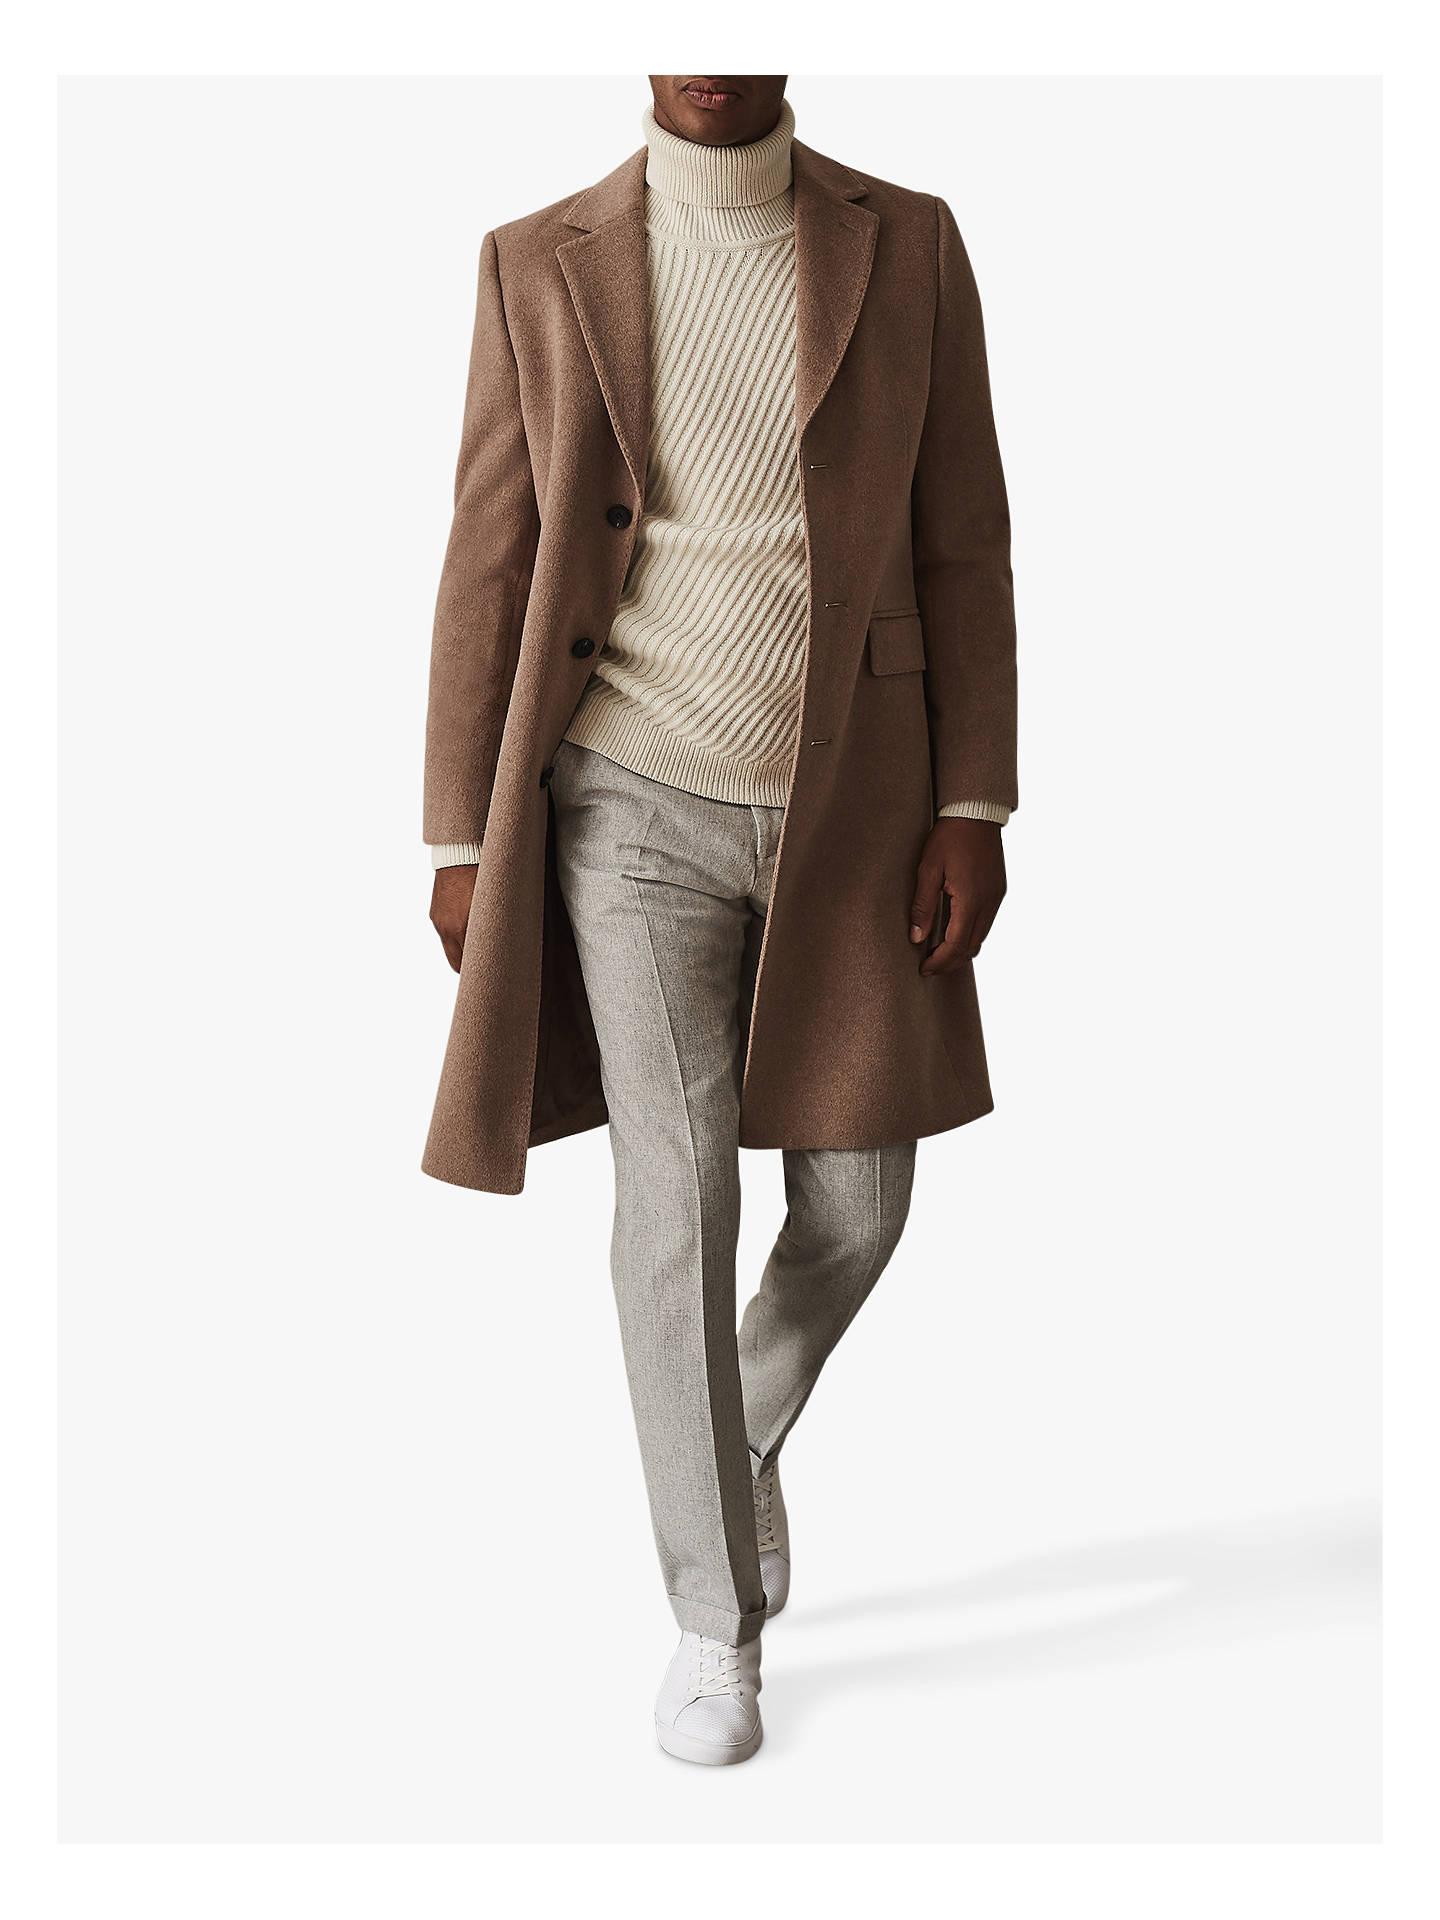 6820fbadcb31f2 Buy Reiss Ranger Flannel Slim Fit Trousers, Light Grey, 30R Online at  johnlewis.